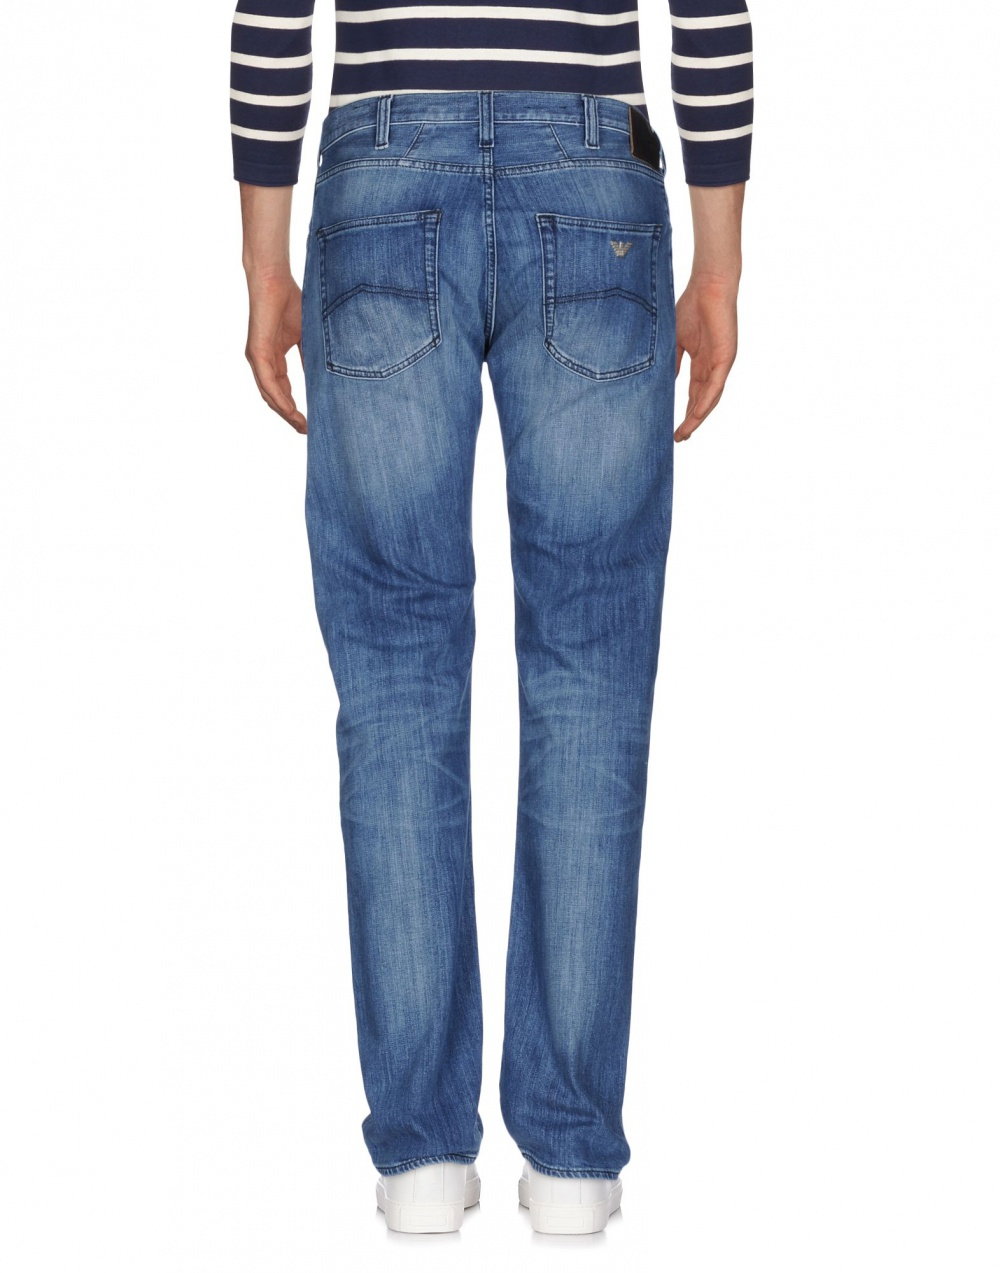 Мужские джинсы ARMANI JEANS, 29W-34L (Размер Джинсов).